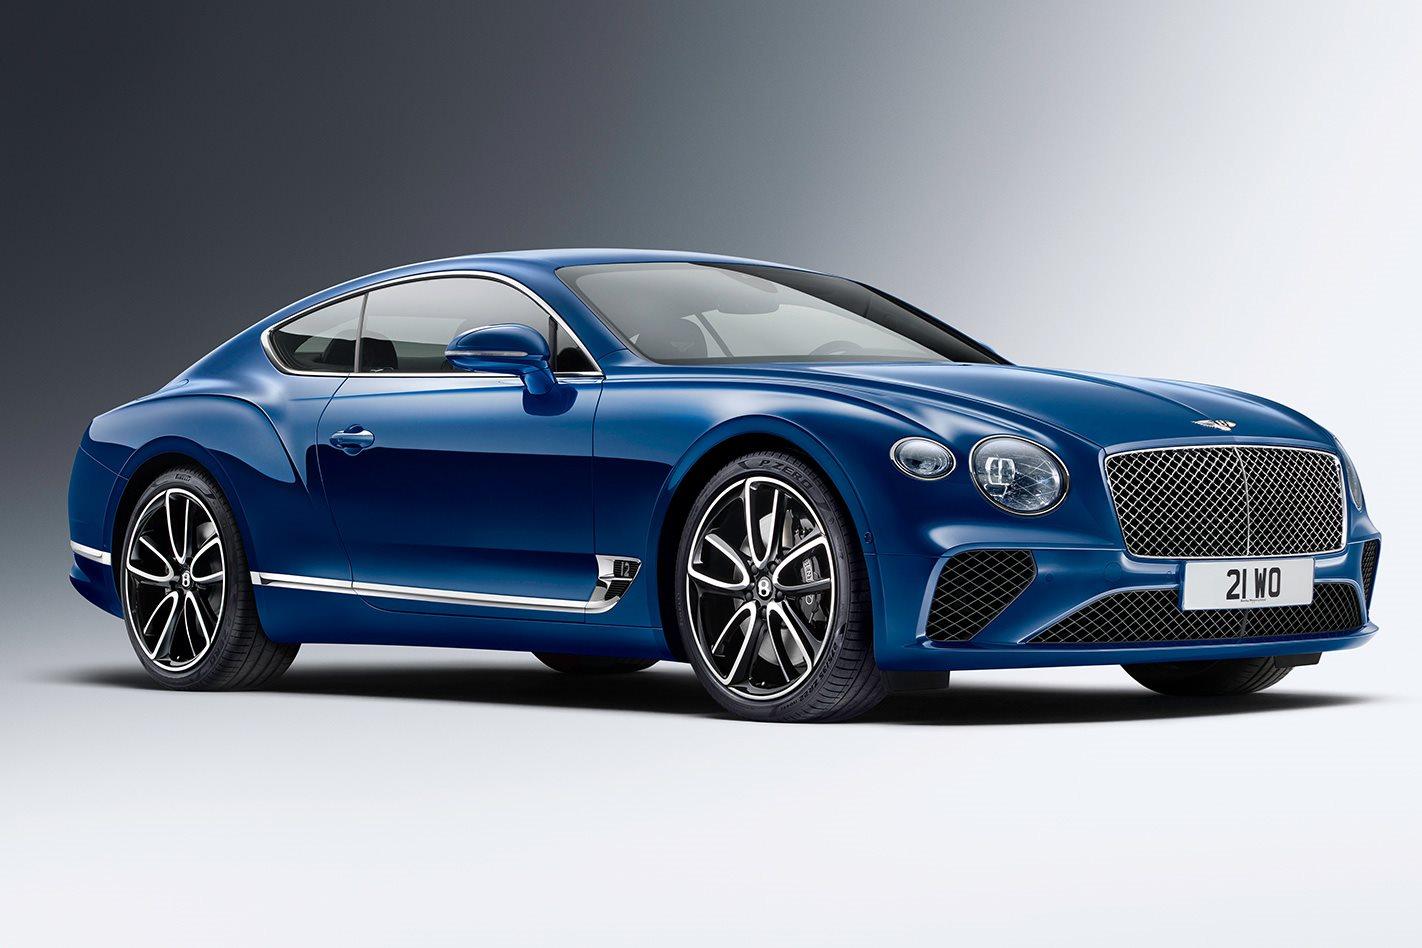 2018 Bentley Continental GT front